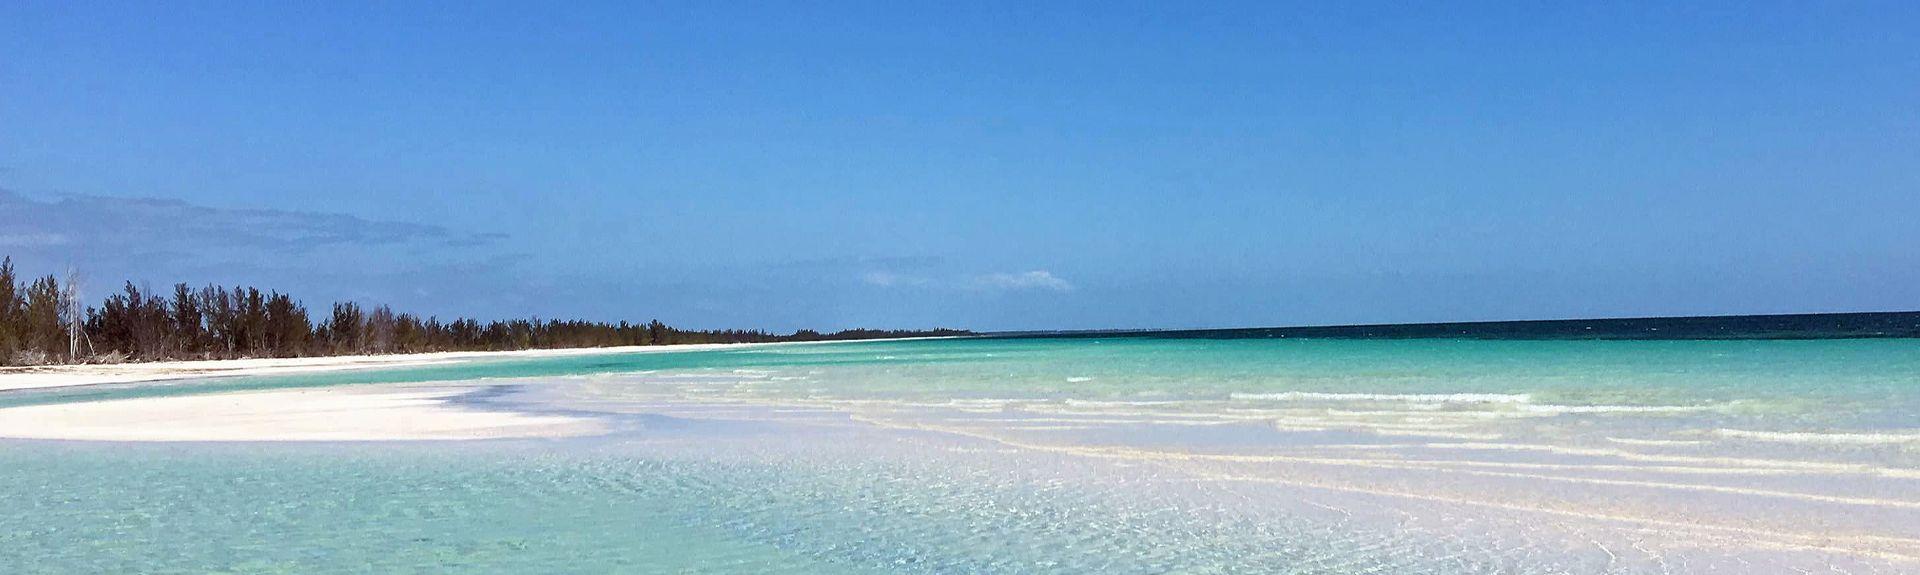 Pelican Point, East Grand Bahama, Bahamas